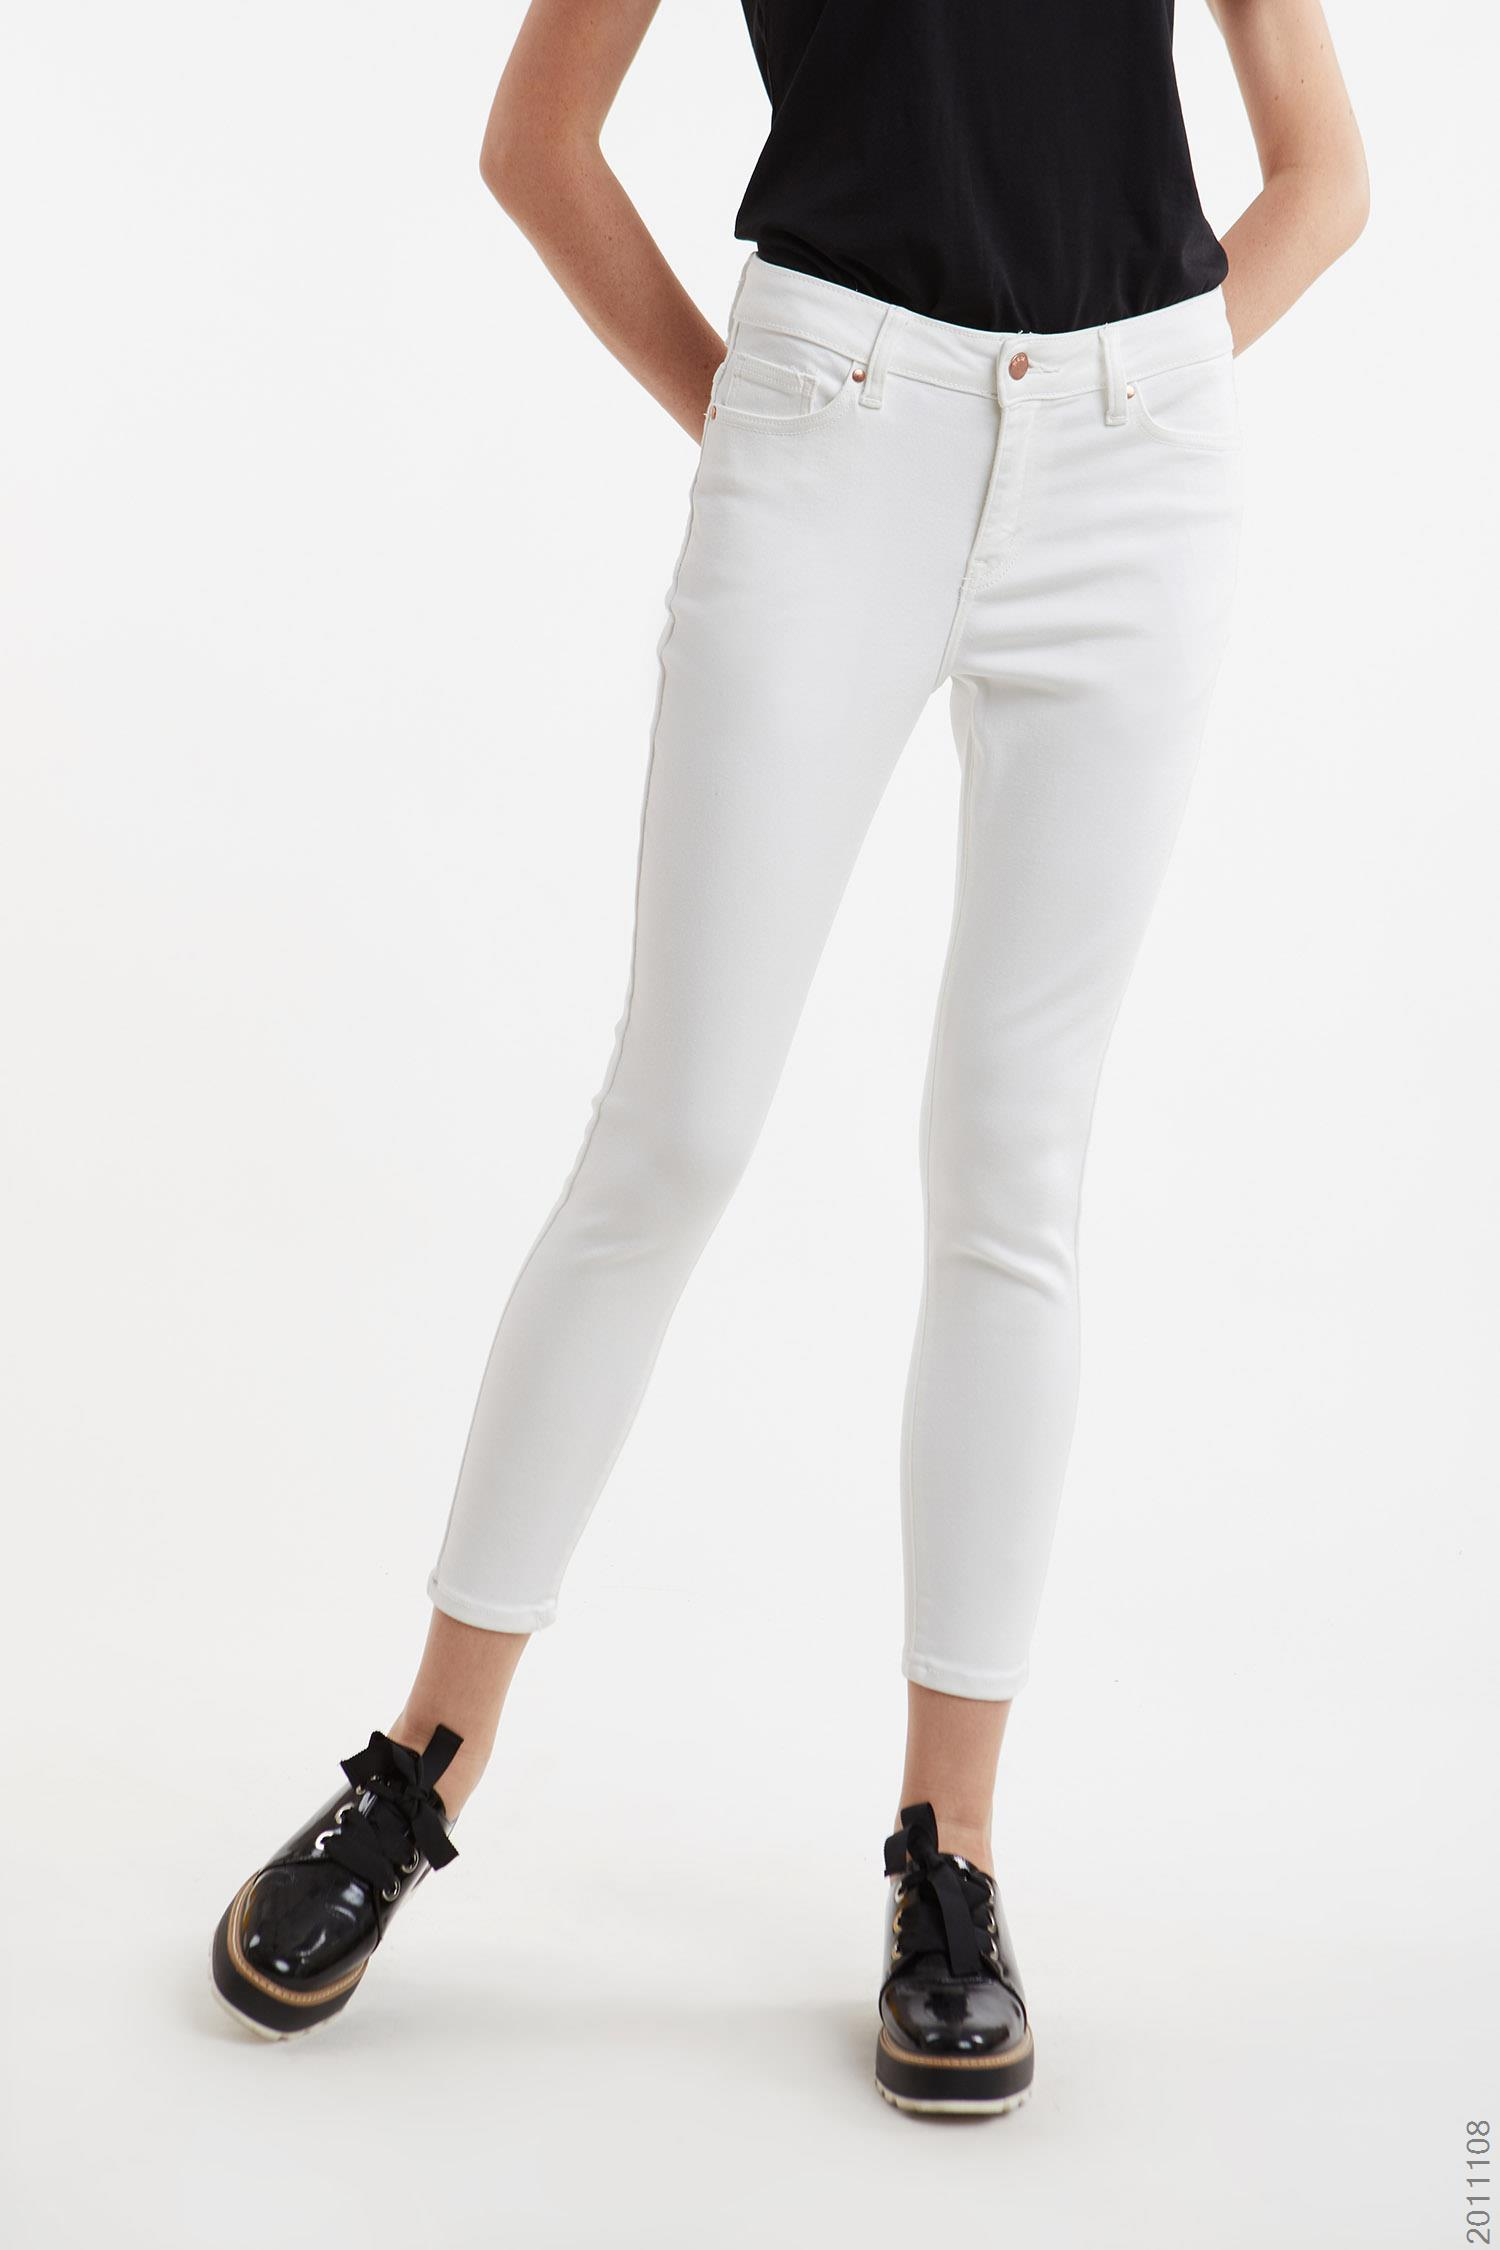 quần jean nữ - 2011108